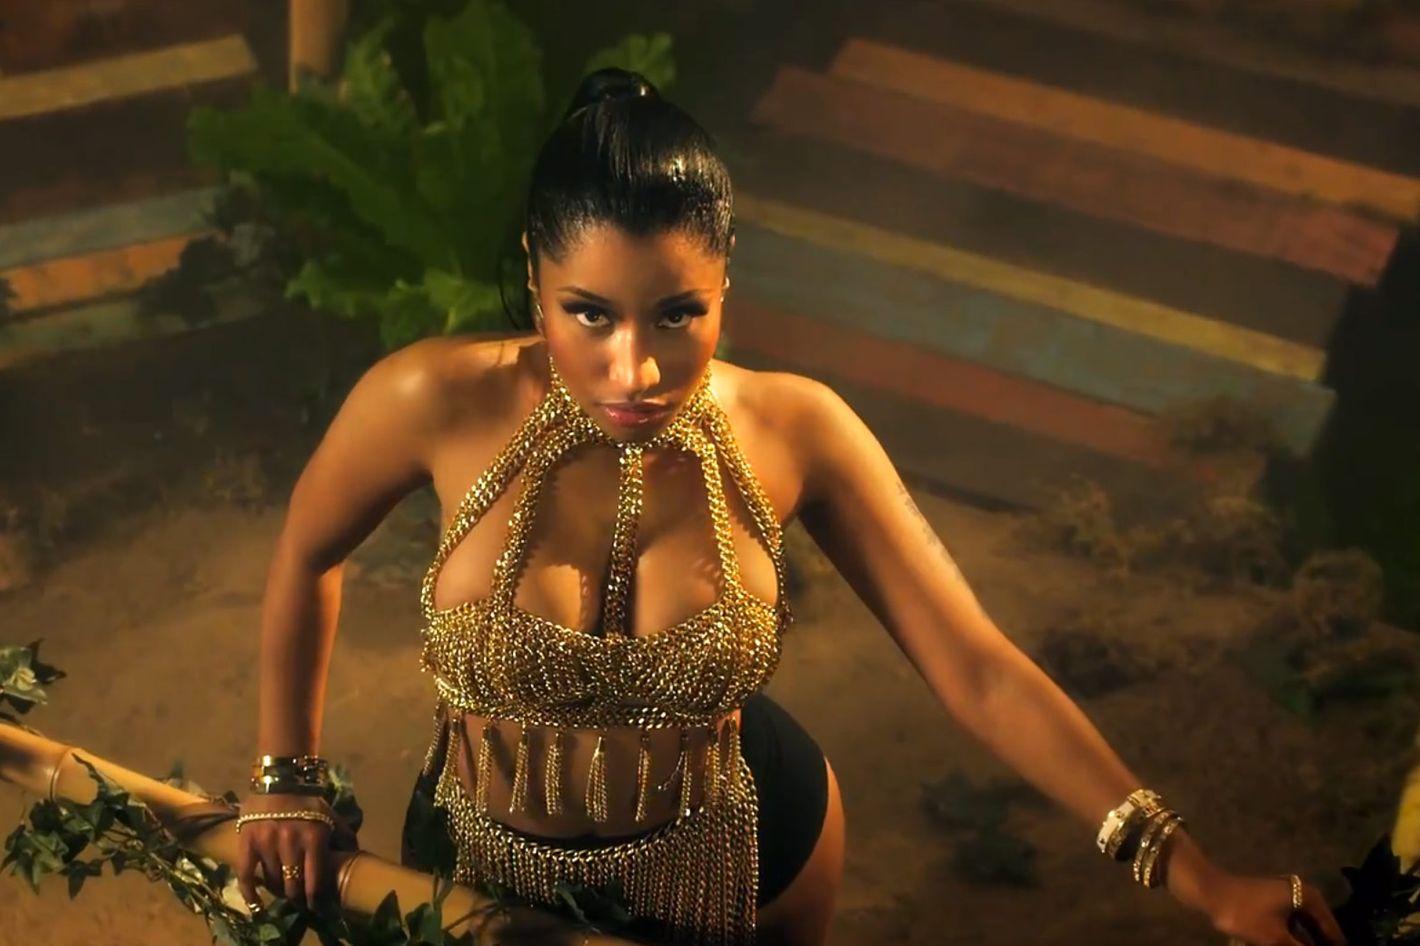 Nicki Minaj's 'Anaconda' Video Is Not Pandering to the Male Gaze